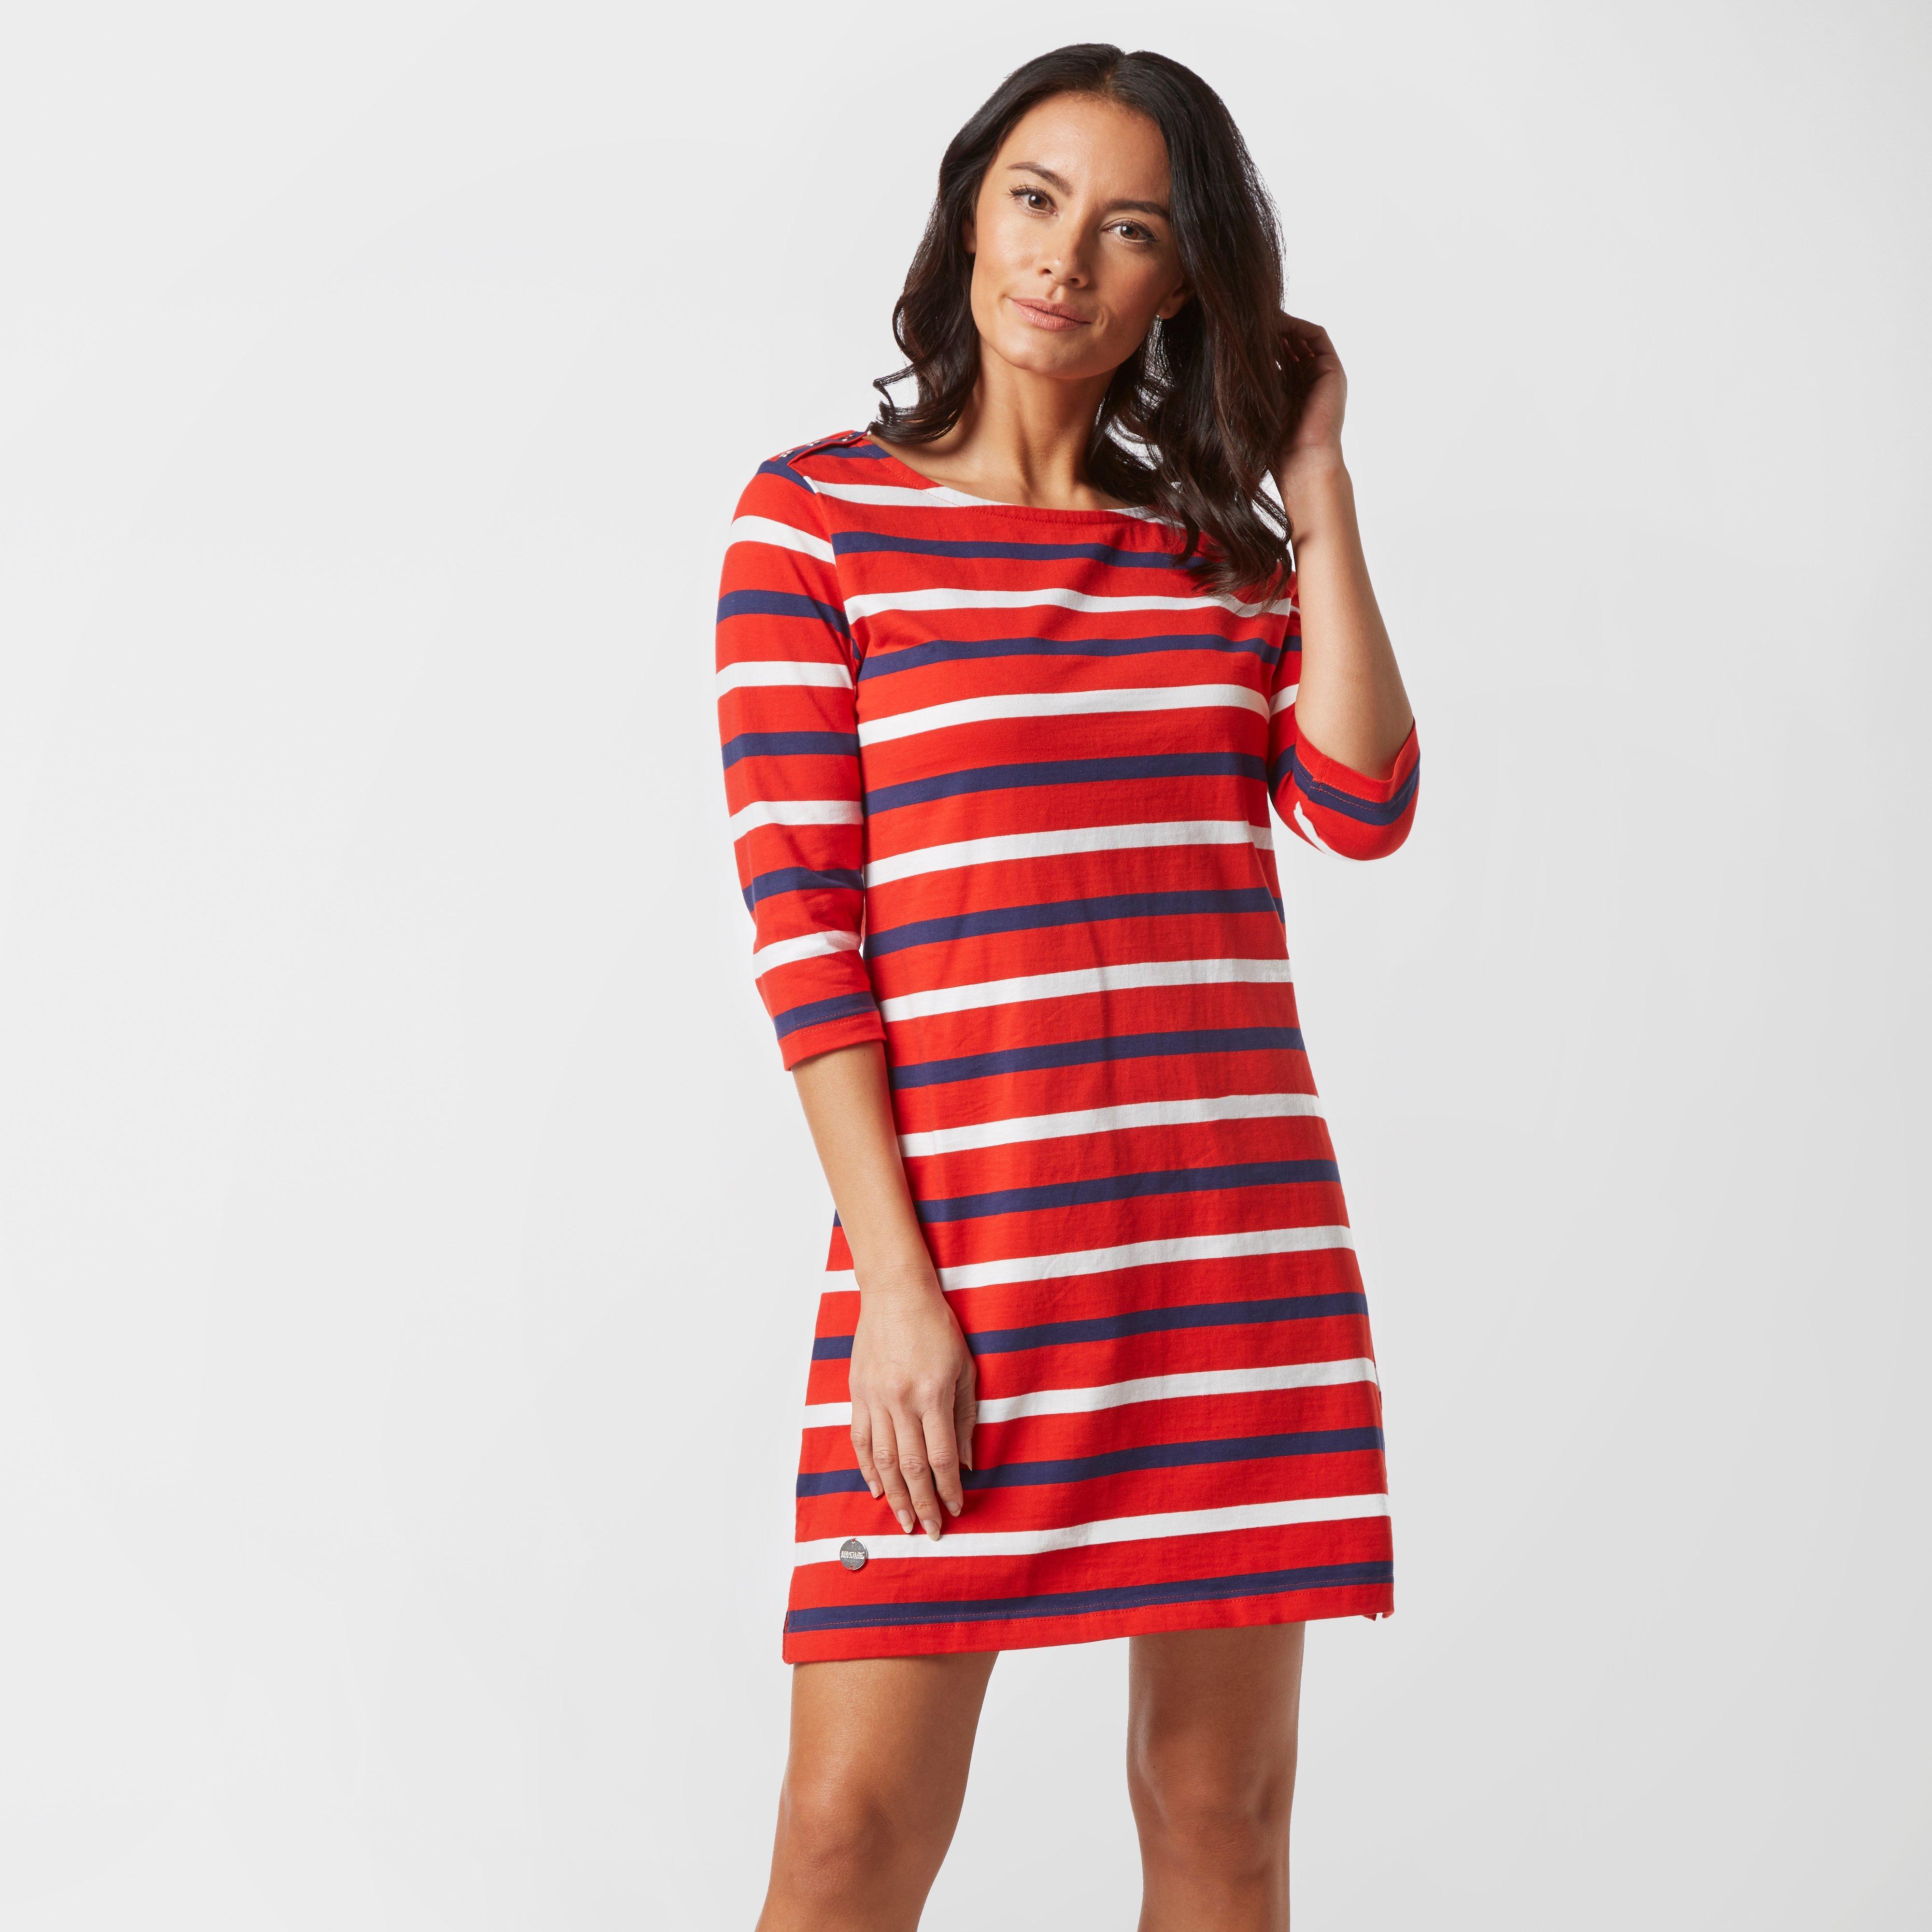 Regatta Regatta Womens Harlee Striped Dress - Red, Red